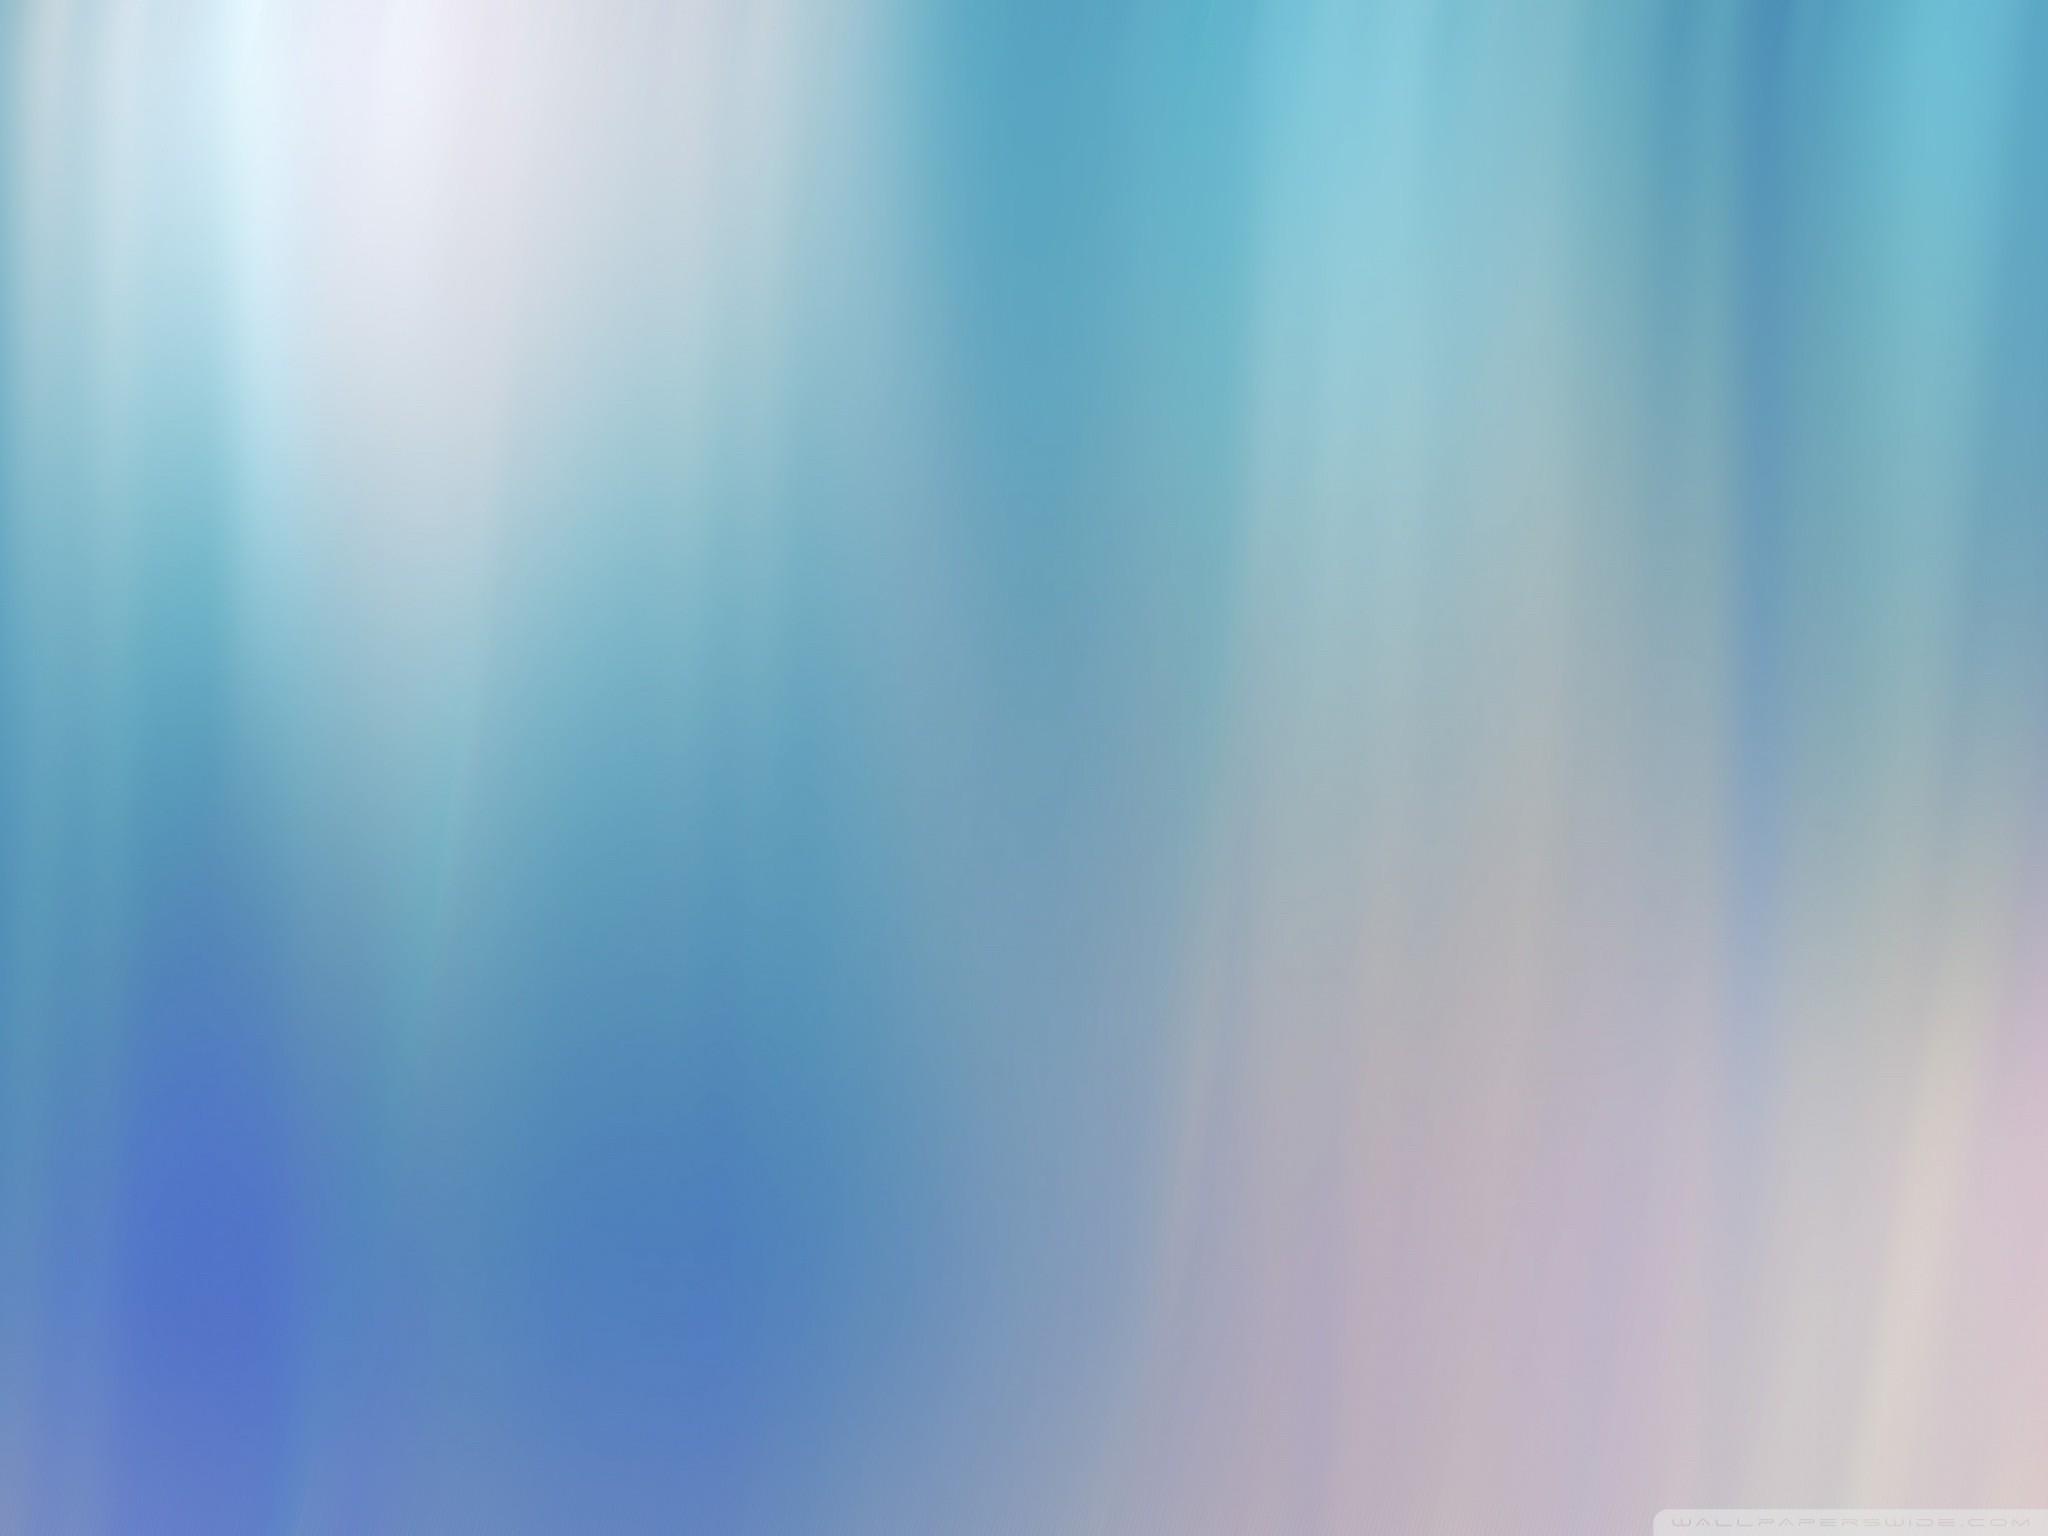 Light Blue Wallpaper